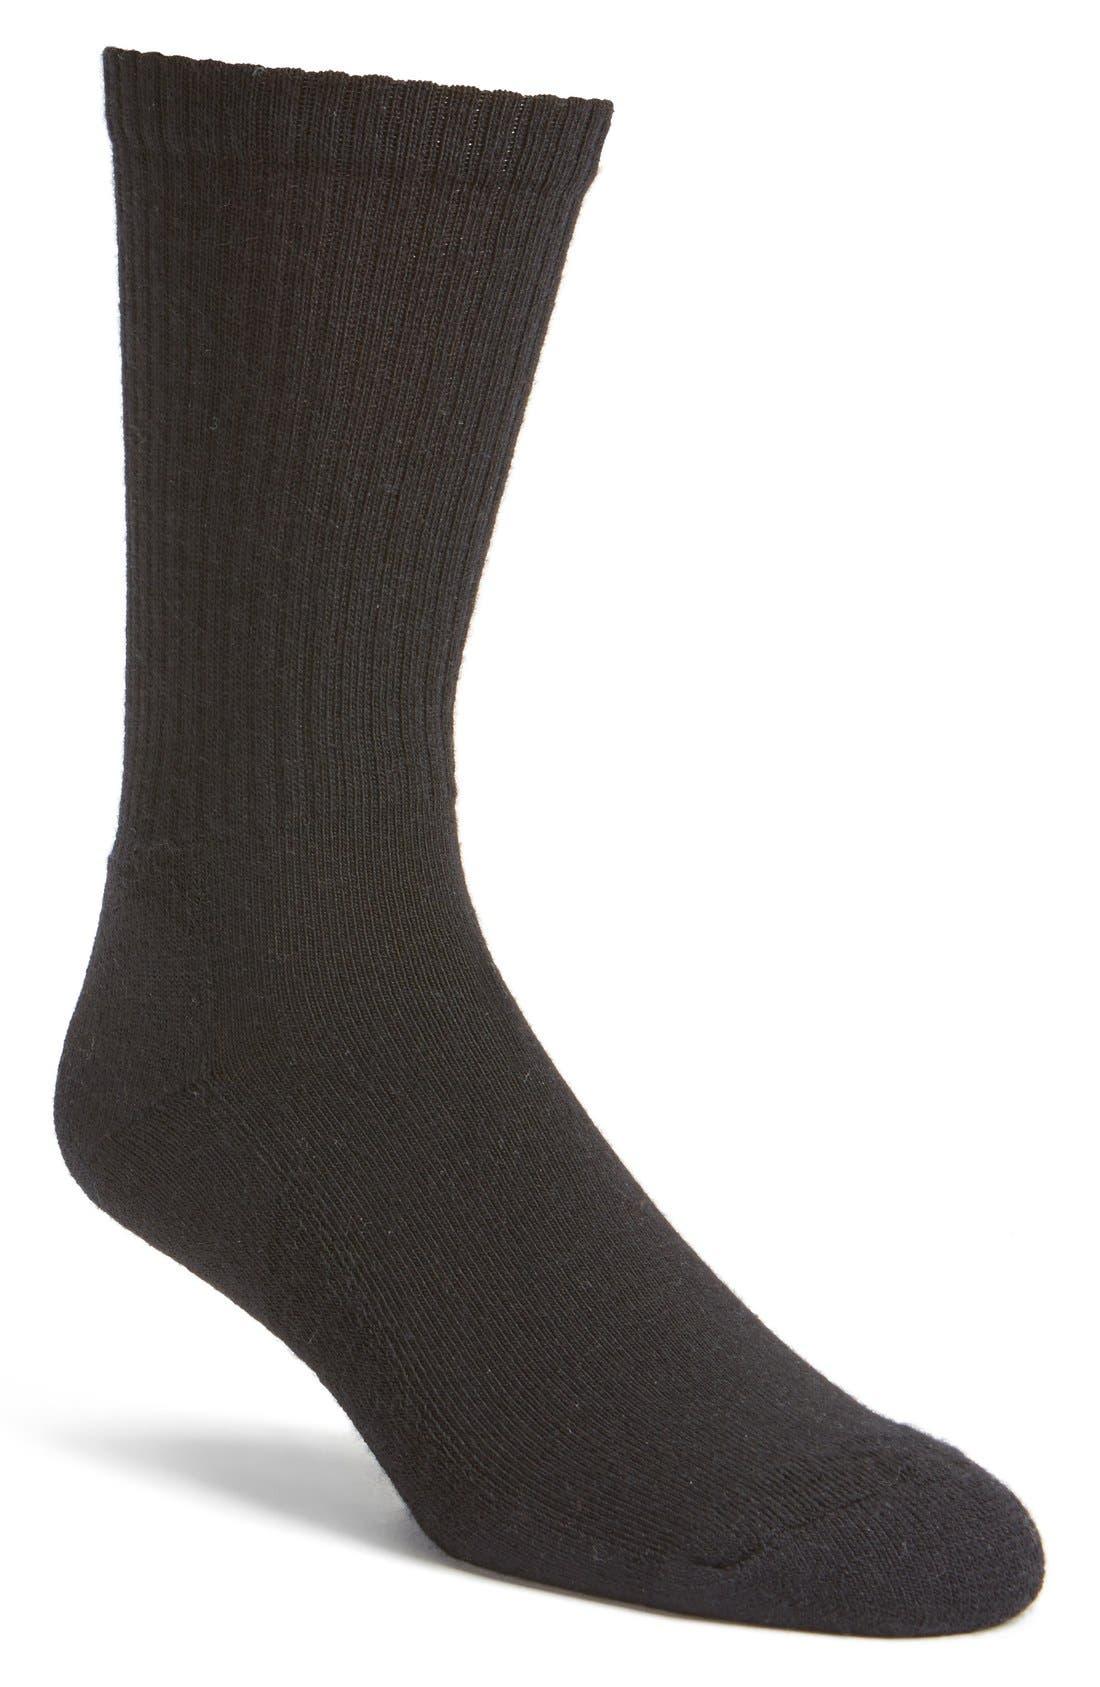 Main Image - Smartwool Heathered Crew Socks (Men)